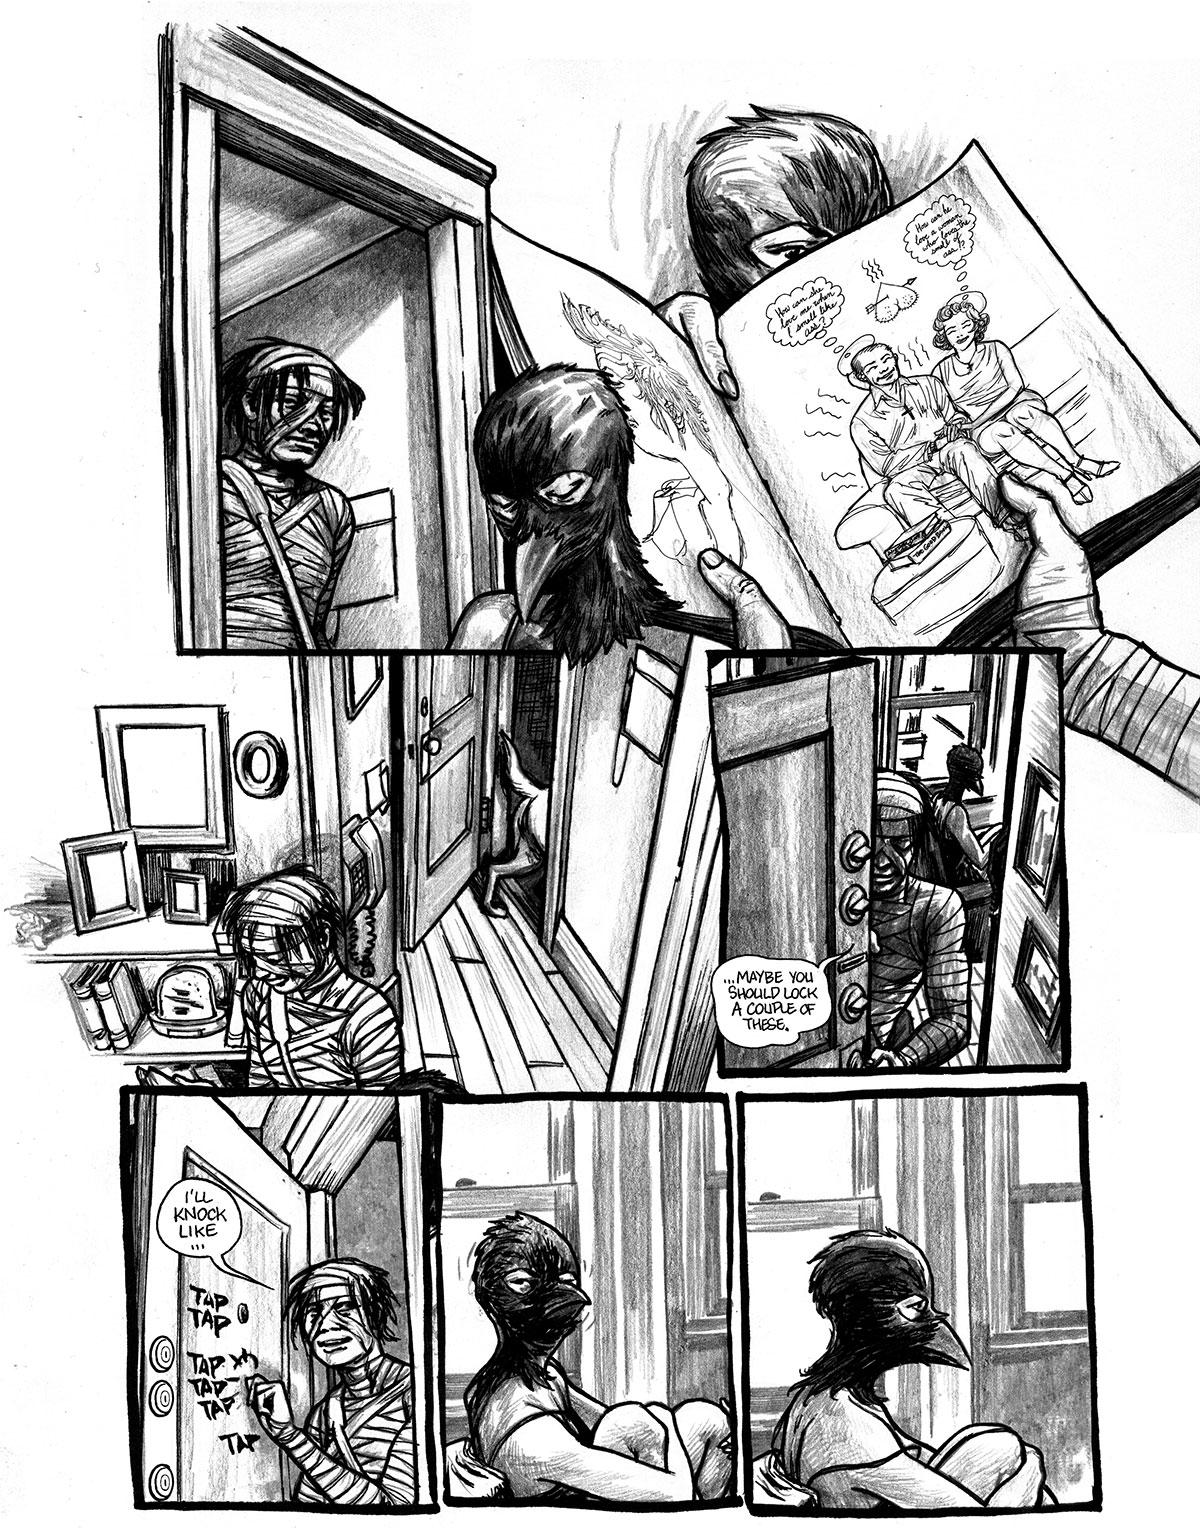 Comic by Jim Munroe and Salgood Sam